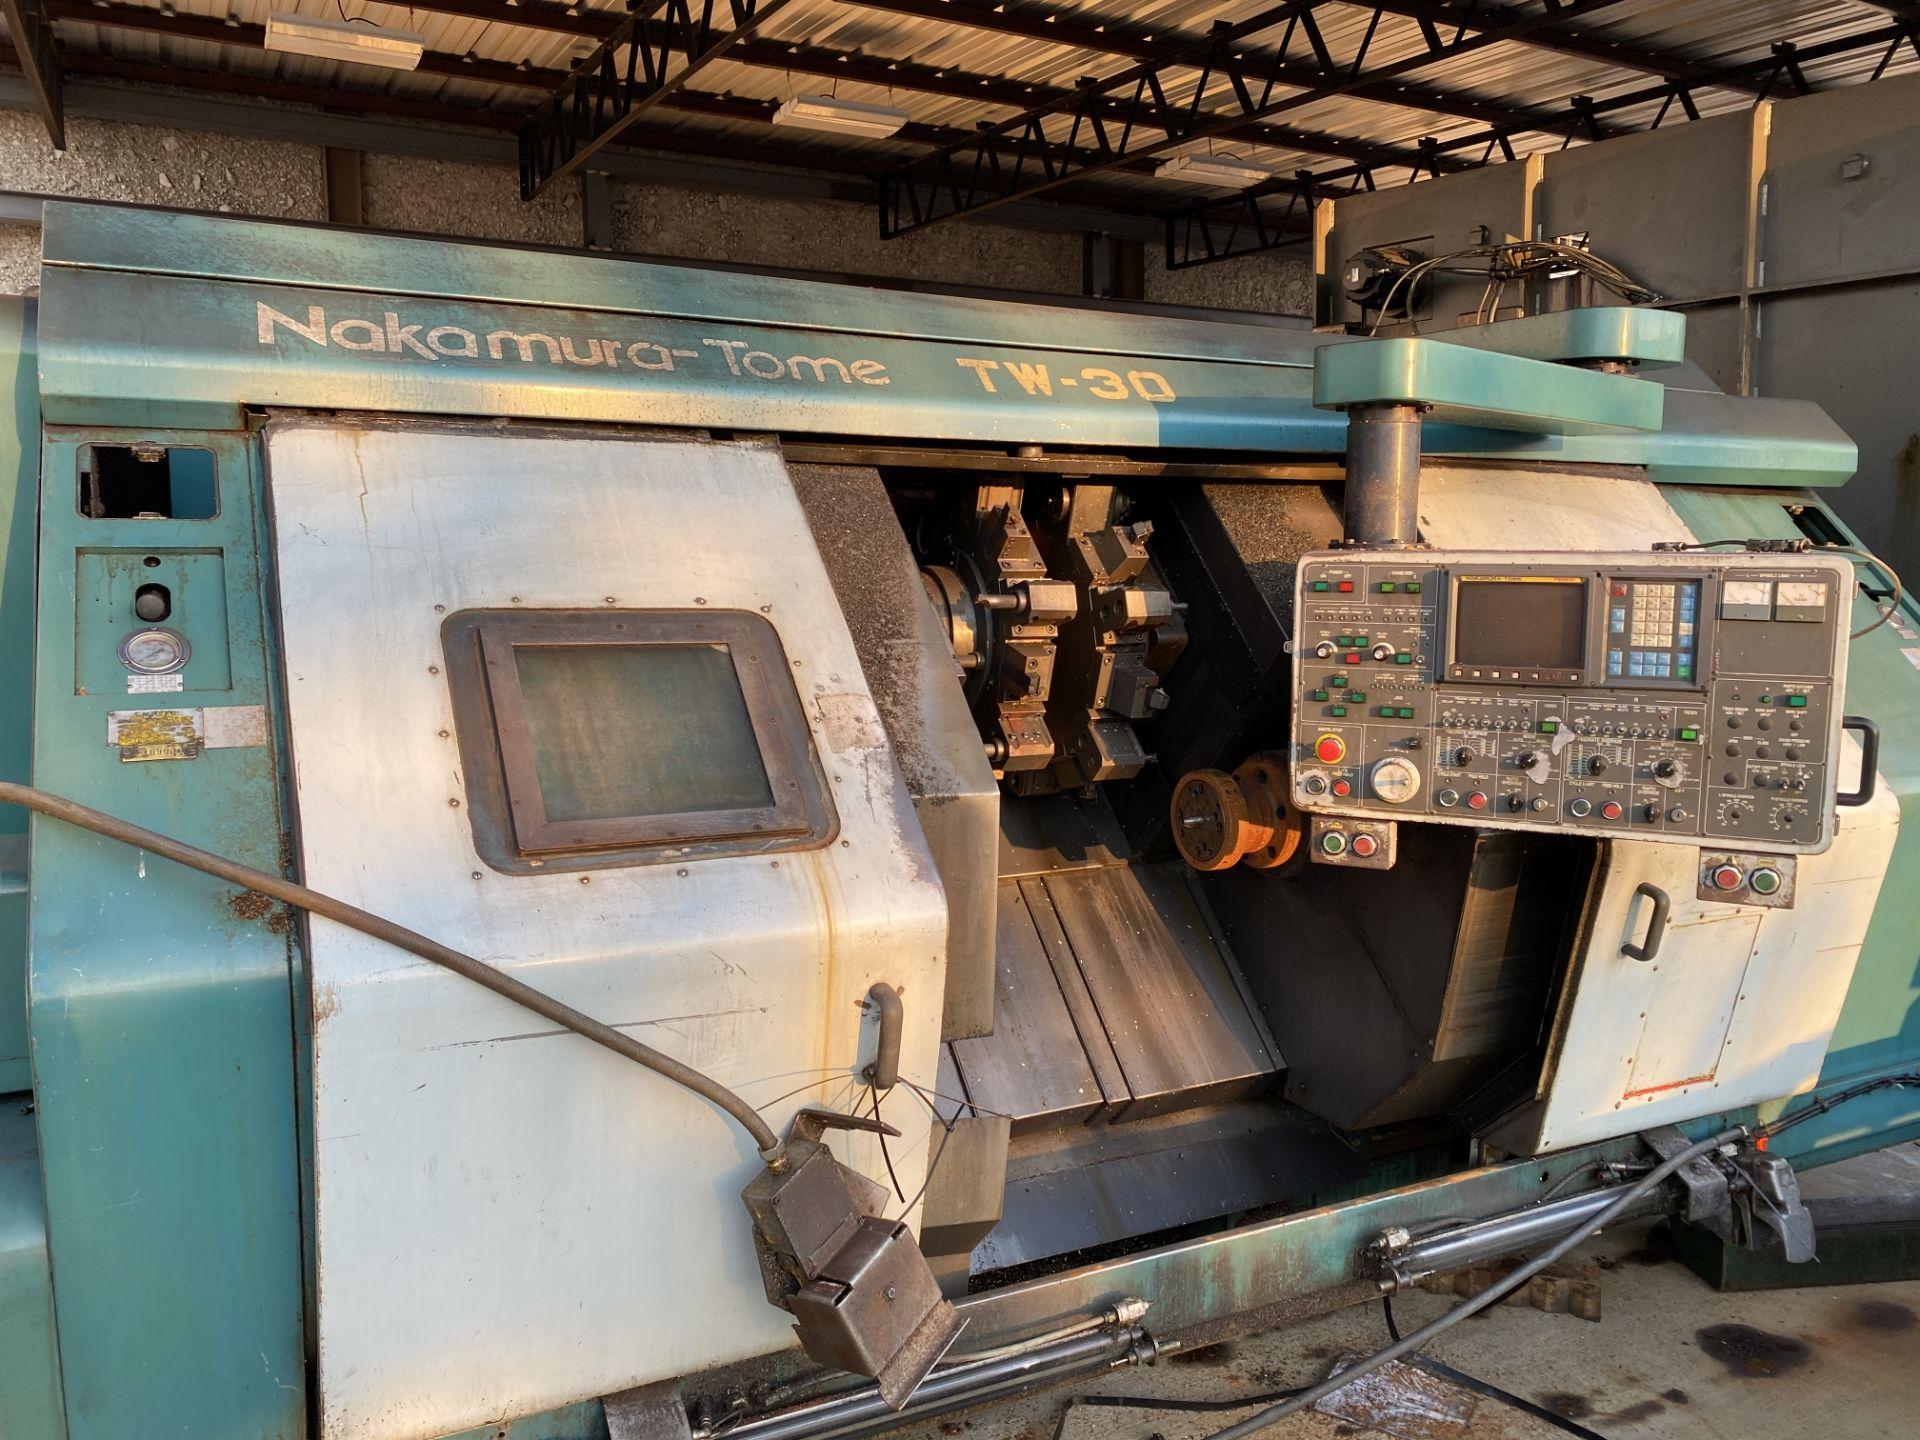 Nakamura-Tome #TW-30 CNC Lathe